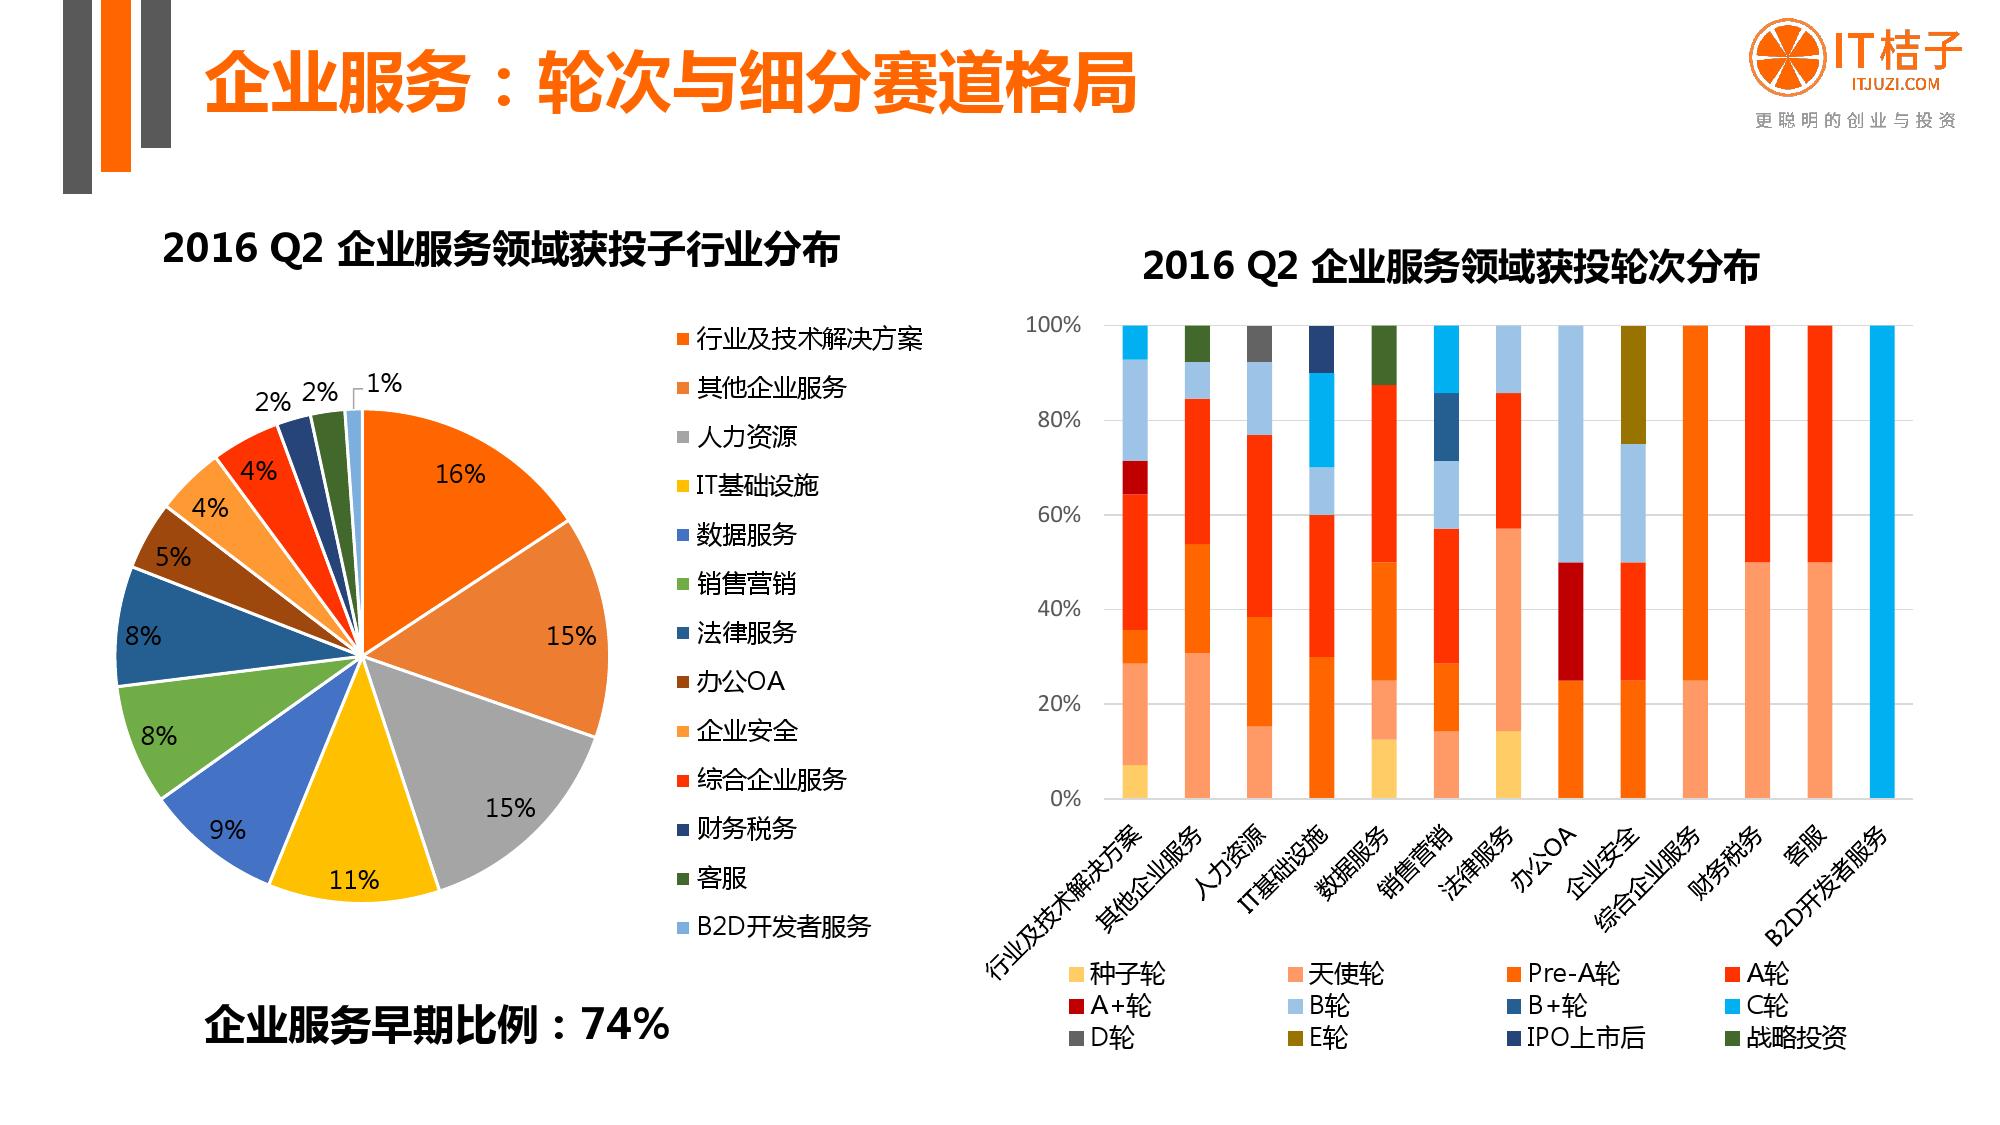 【IT桔子】2016年Q2中国互联网创业投资分析报告_000034